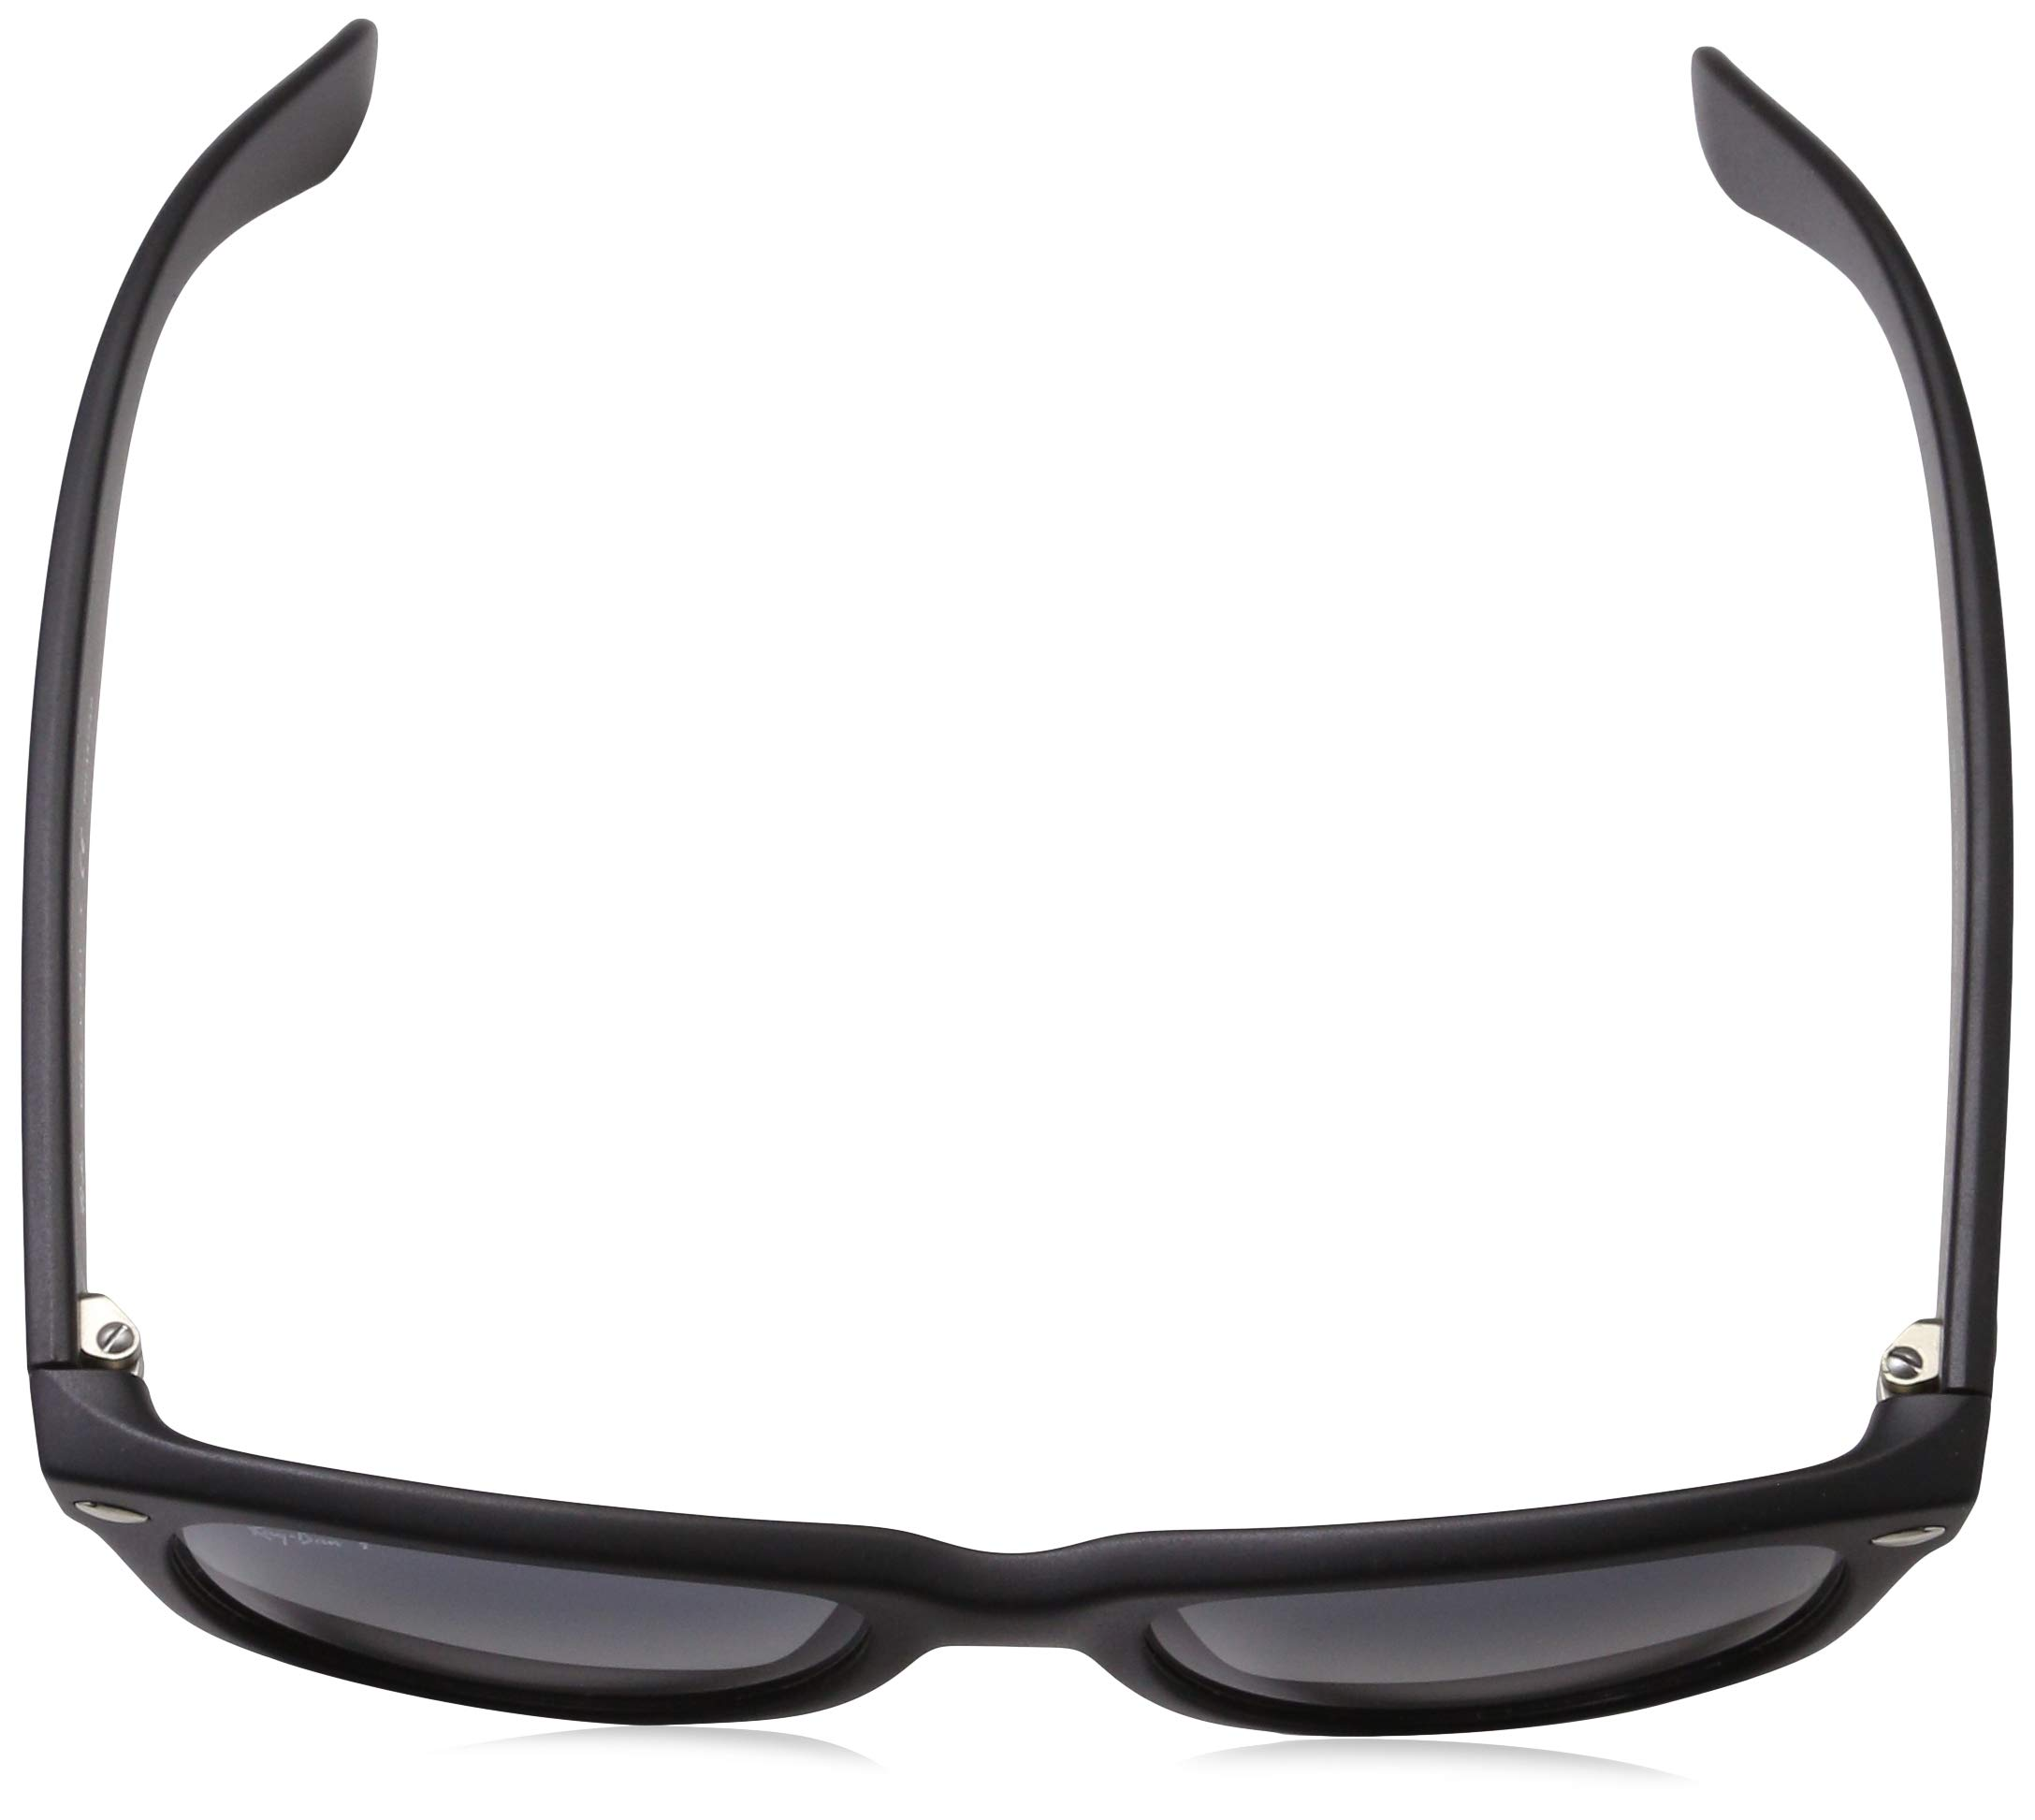 Ray-Ban Unisex New Wayfarer Polarized Sunglasses, Black/Polarized Blue/Grey Gradient, Blue Gradient Grey, 55mm by Ray-Ban (Image #4)